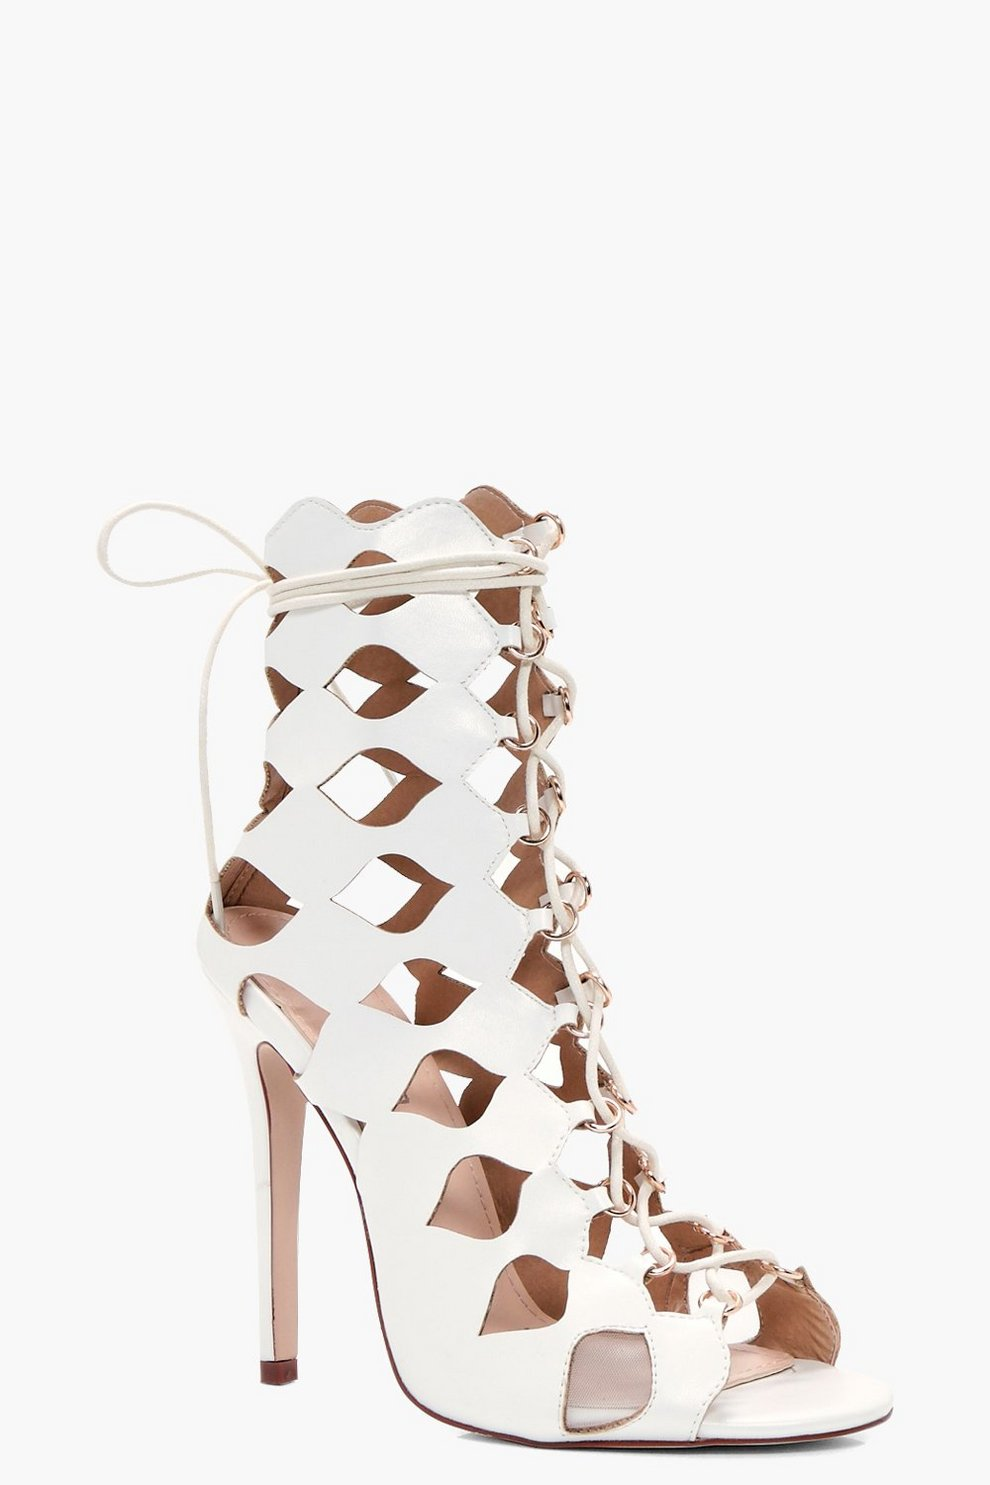 342133b6c667b Alisha Cage Ghillie Lace Up Heels | Boohoo